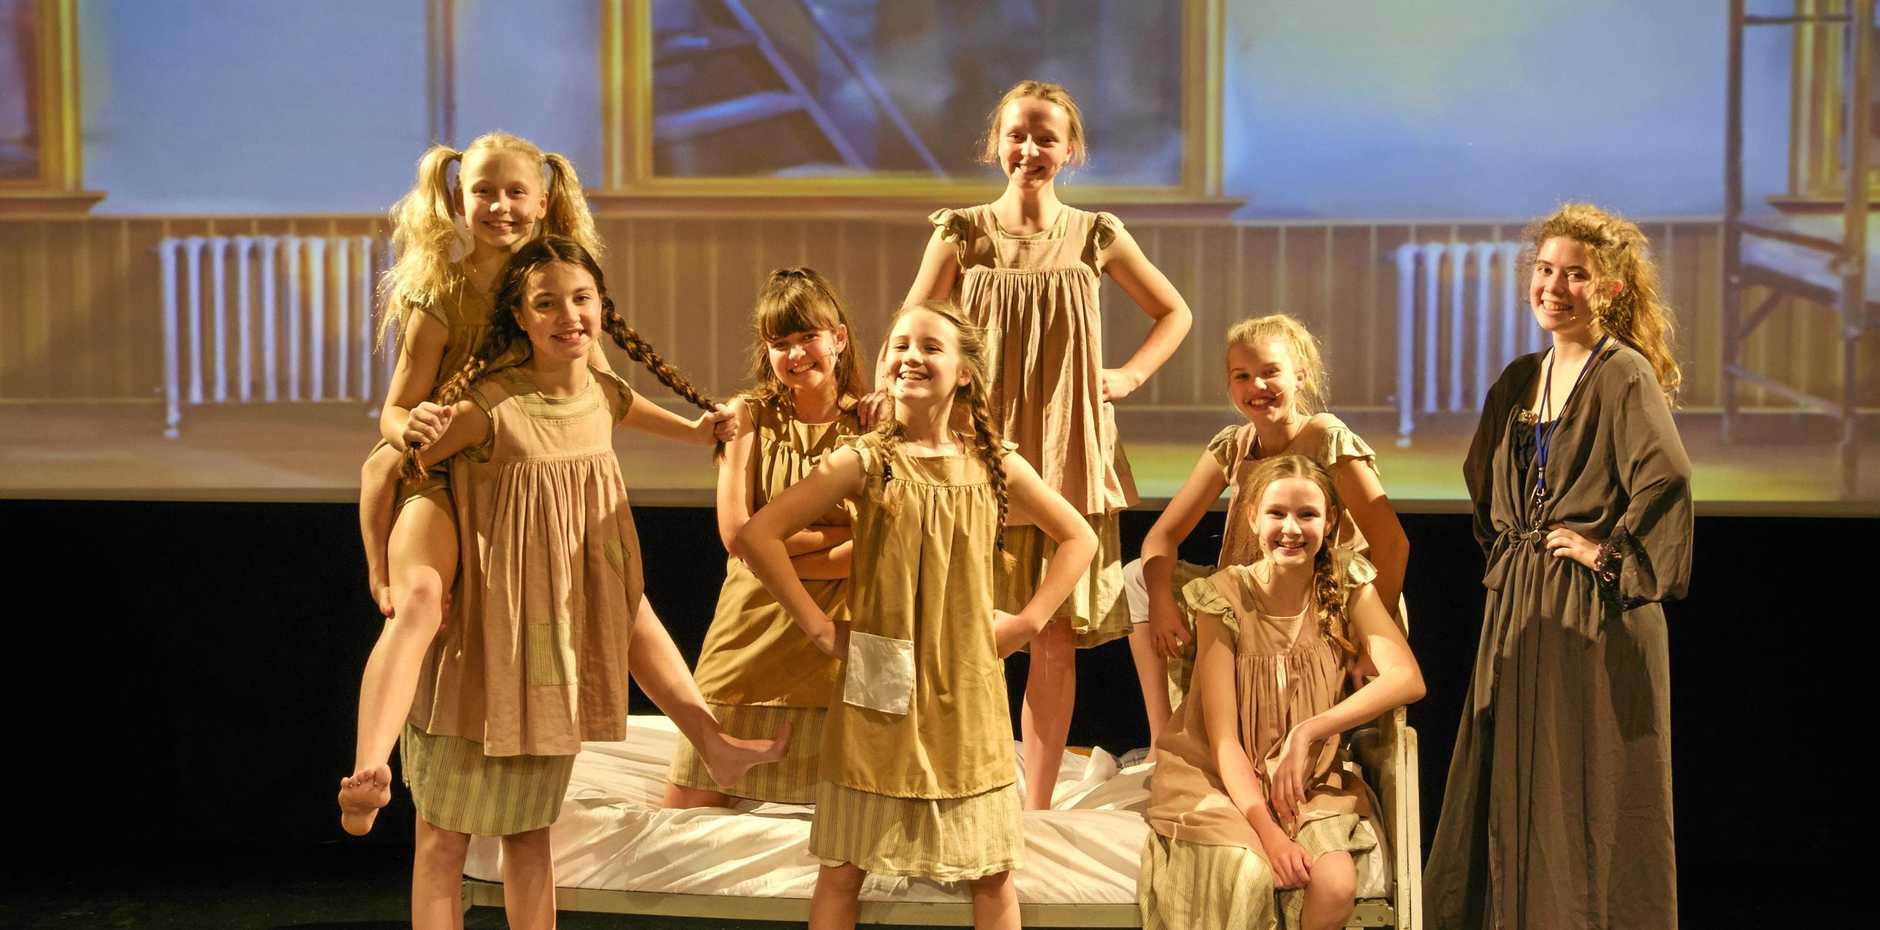 HARD KNOCK LIFE: Shalom performers (from left) Lana Munckton, Tamae Marschke, Chelsea Costar, Charlotte Smith, Charlotte Boge, Kasey Hess, Mikayla Condon and Ella Boas.